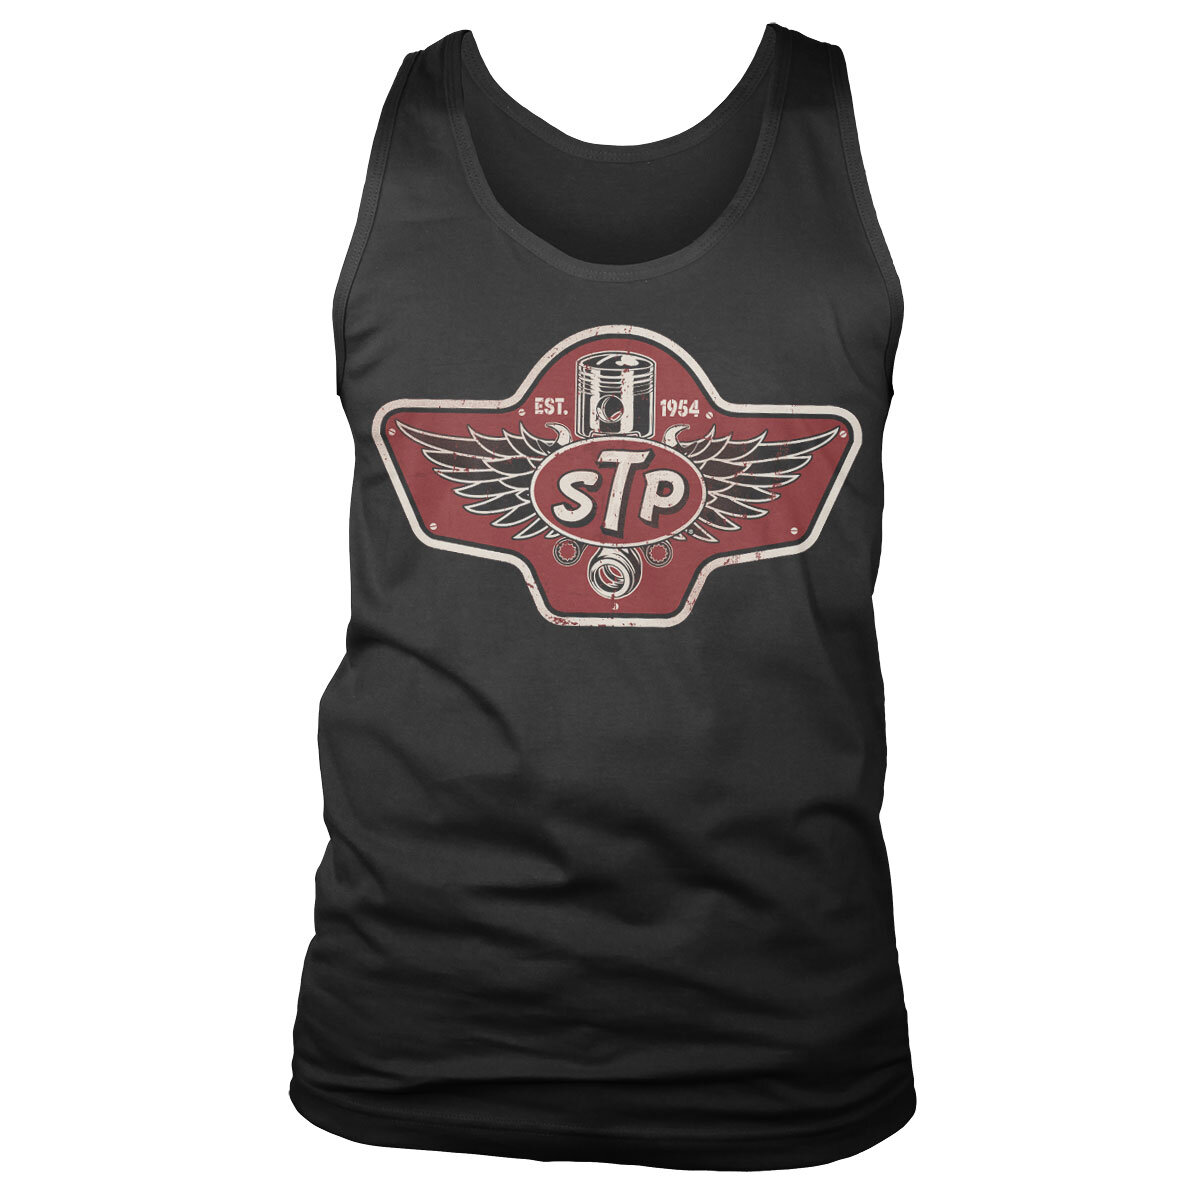 STP Piston Emblem Tank Top